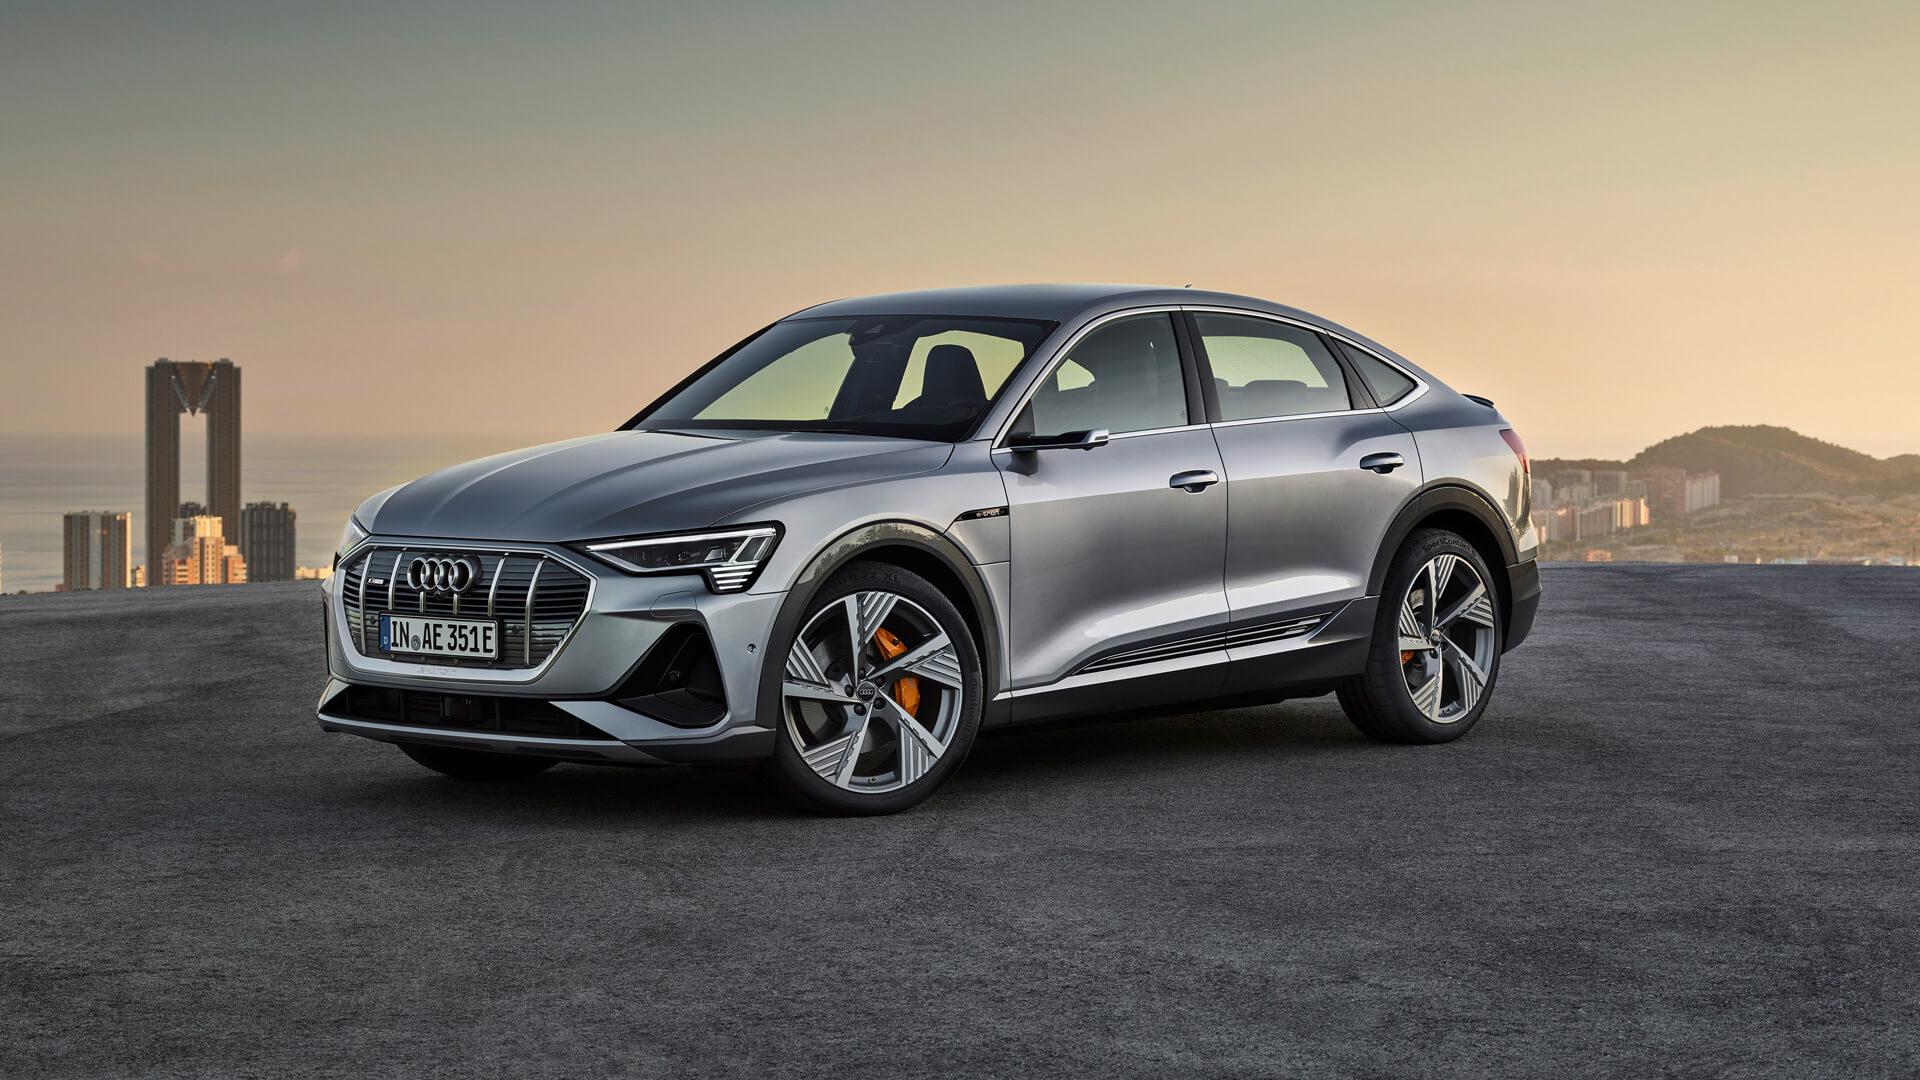 Фотография экоавто Audi e-tron Sportback 55 quattro - фото 6